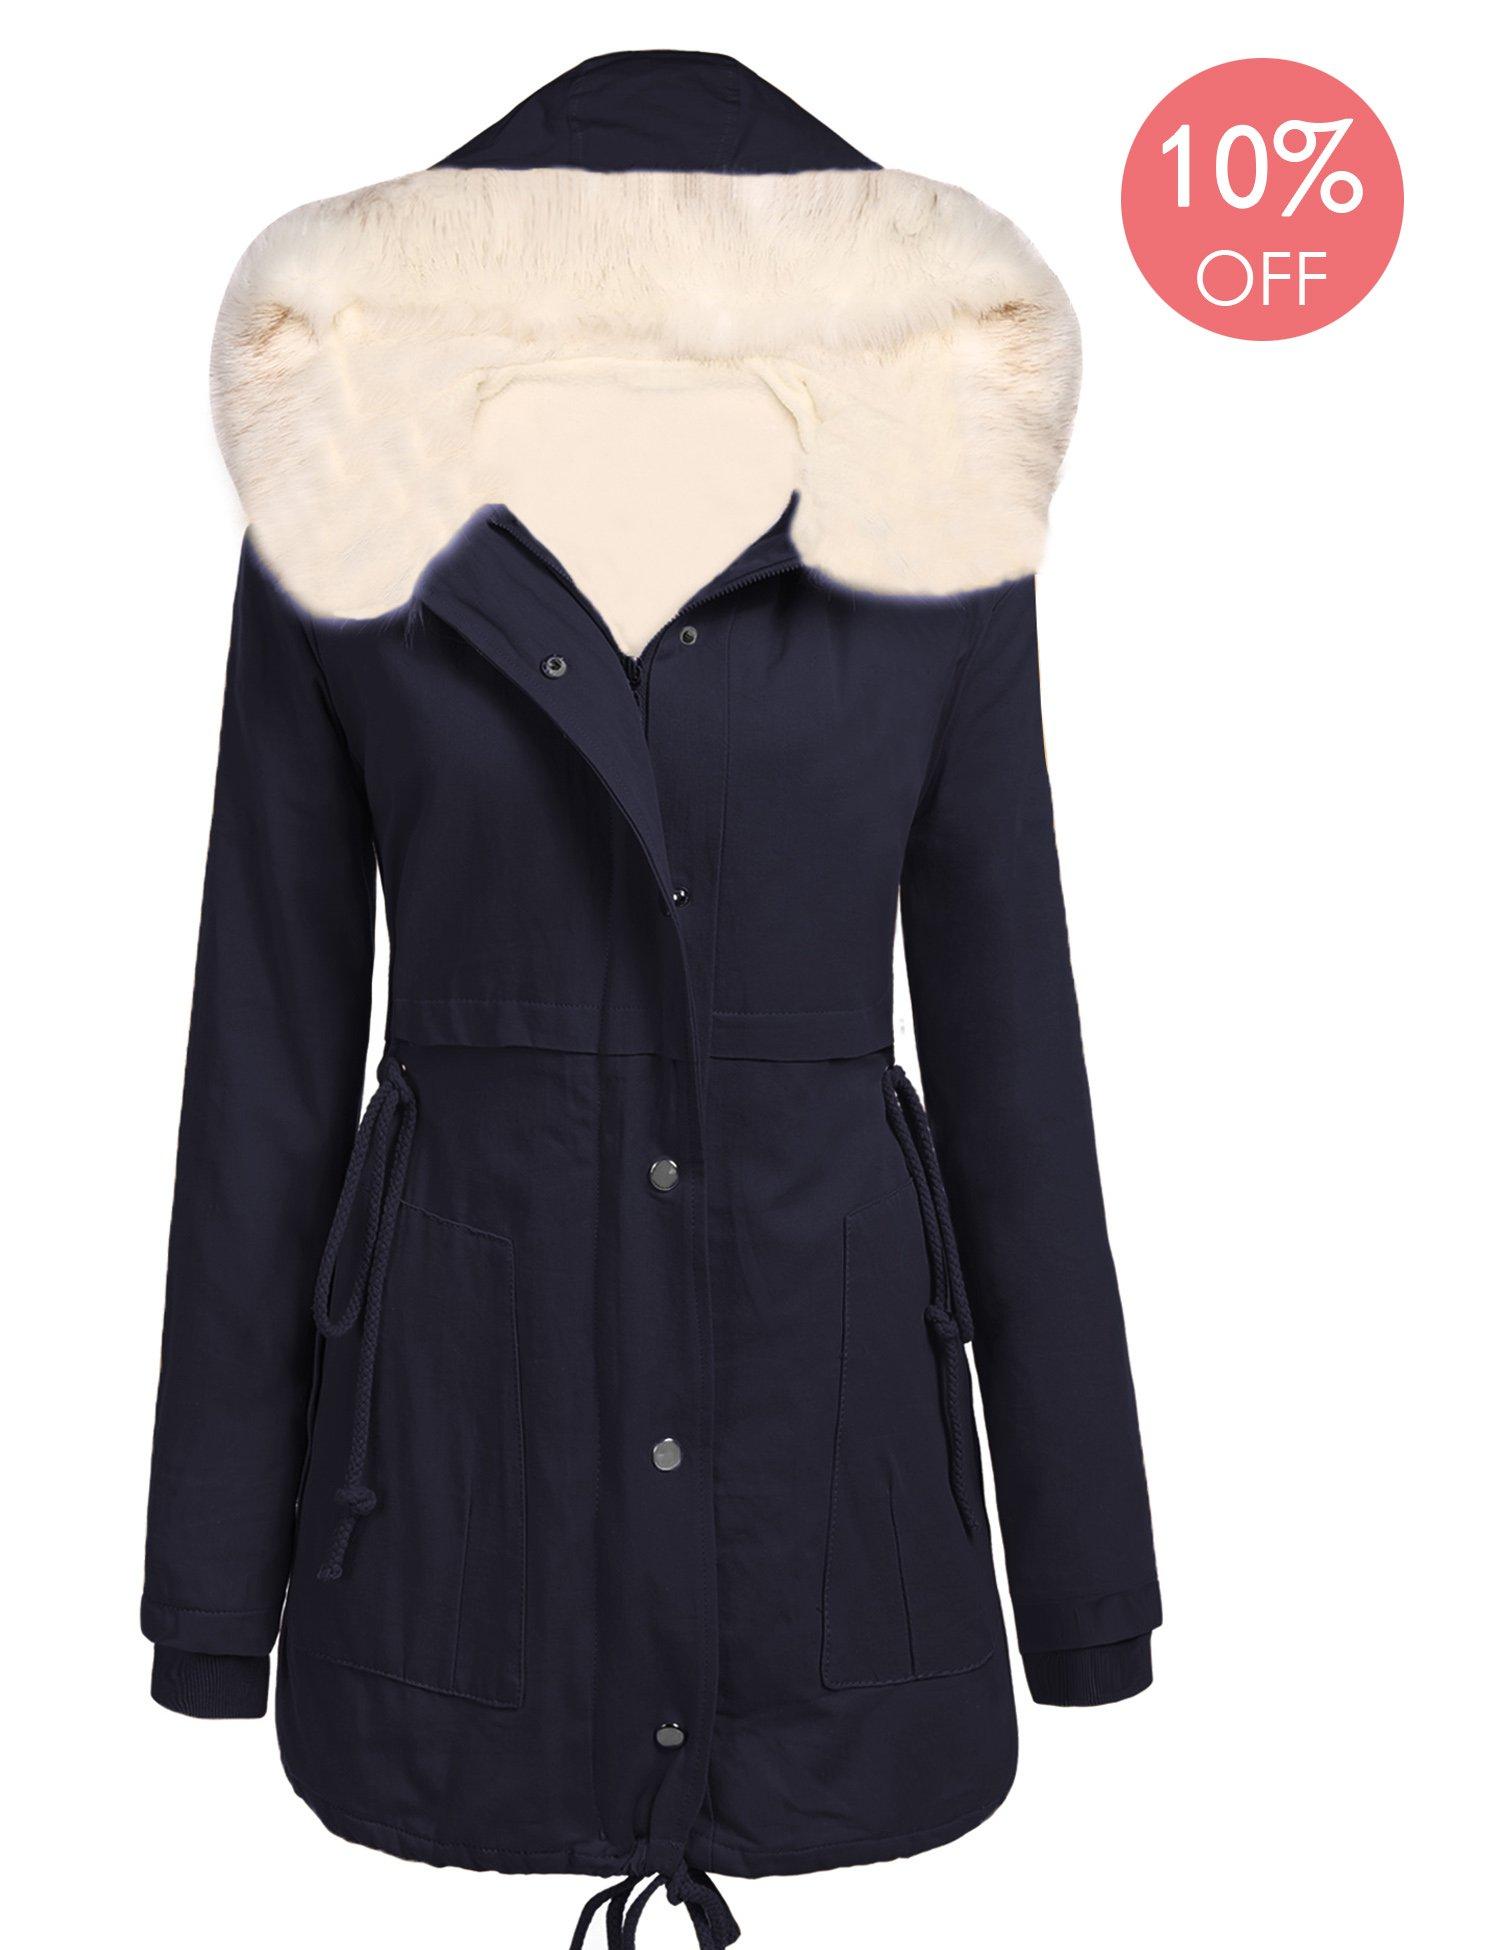 Beyove Womens Plus Size Safari Warm Hooded Military Parka Jacket Coat, Dark Blue, Medium